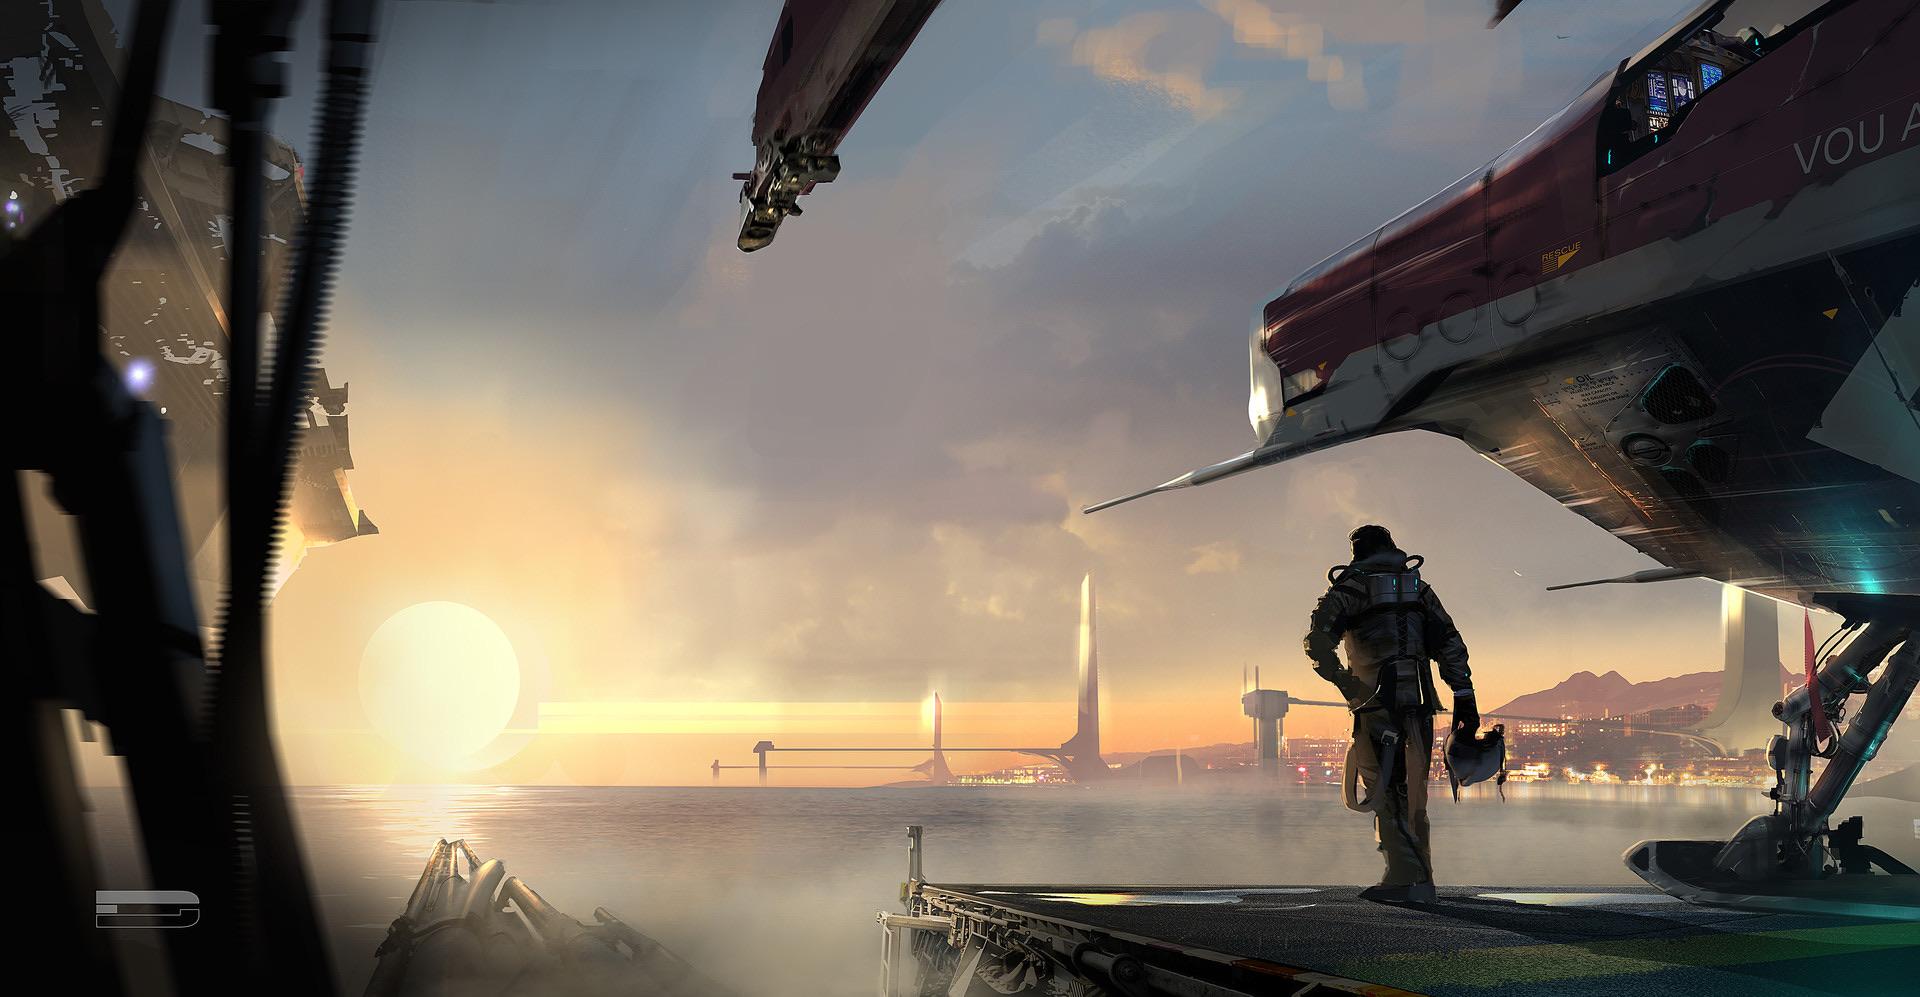 The Science Fiction Art of Romain Jouandeau | Digital Artist |Science Fiction Graphics